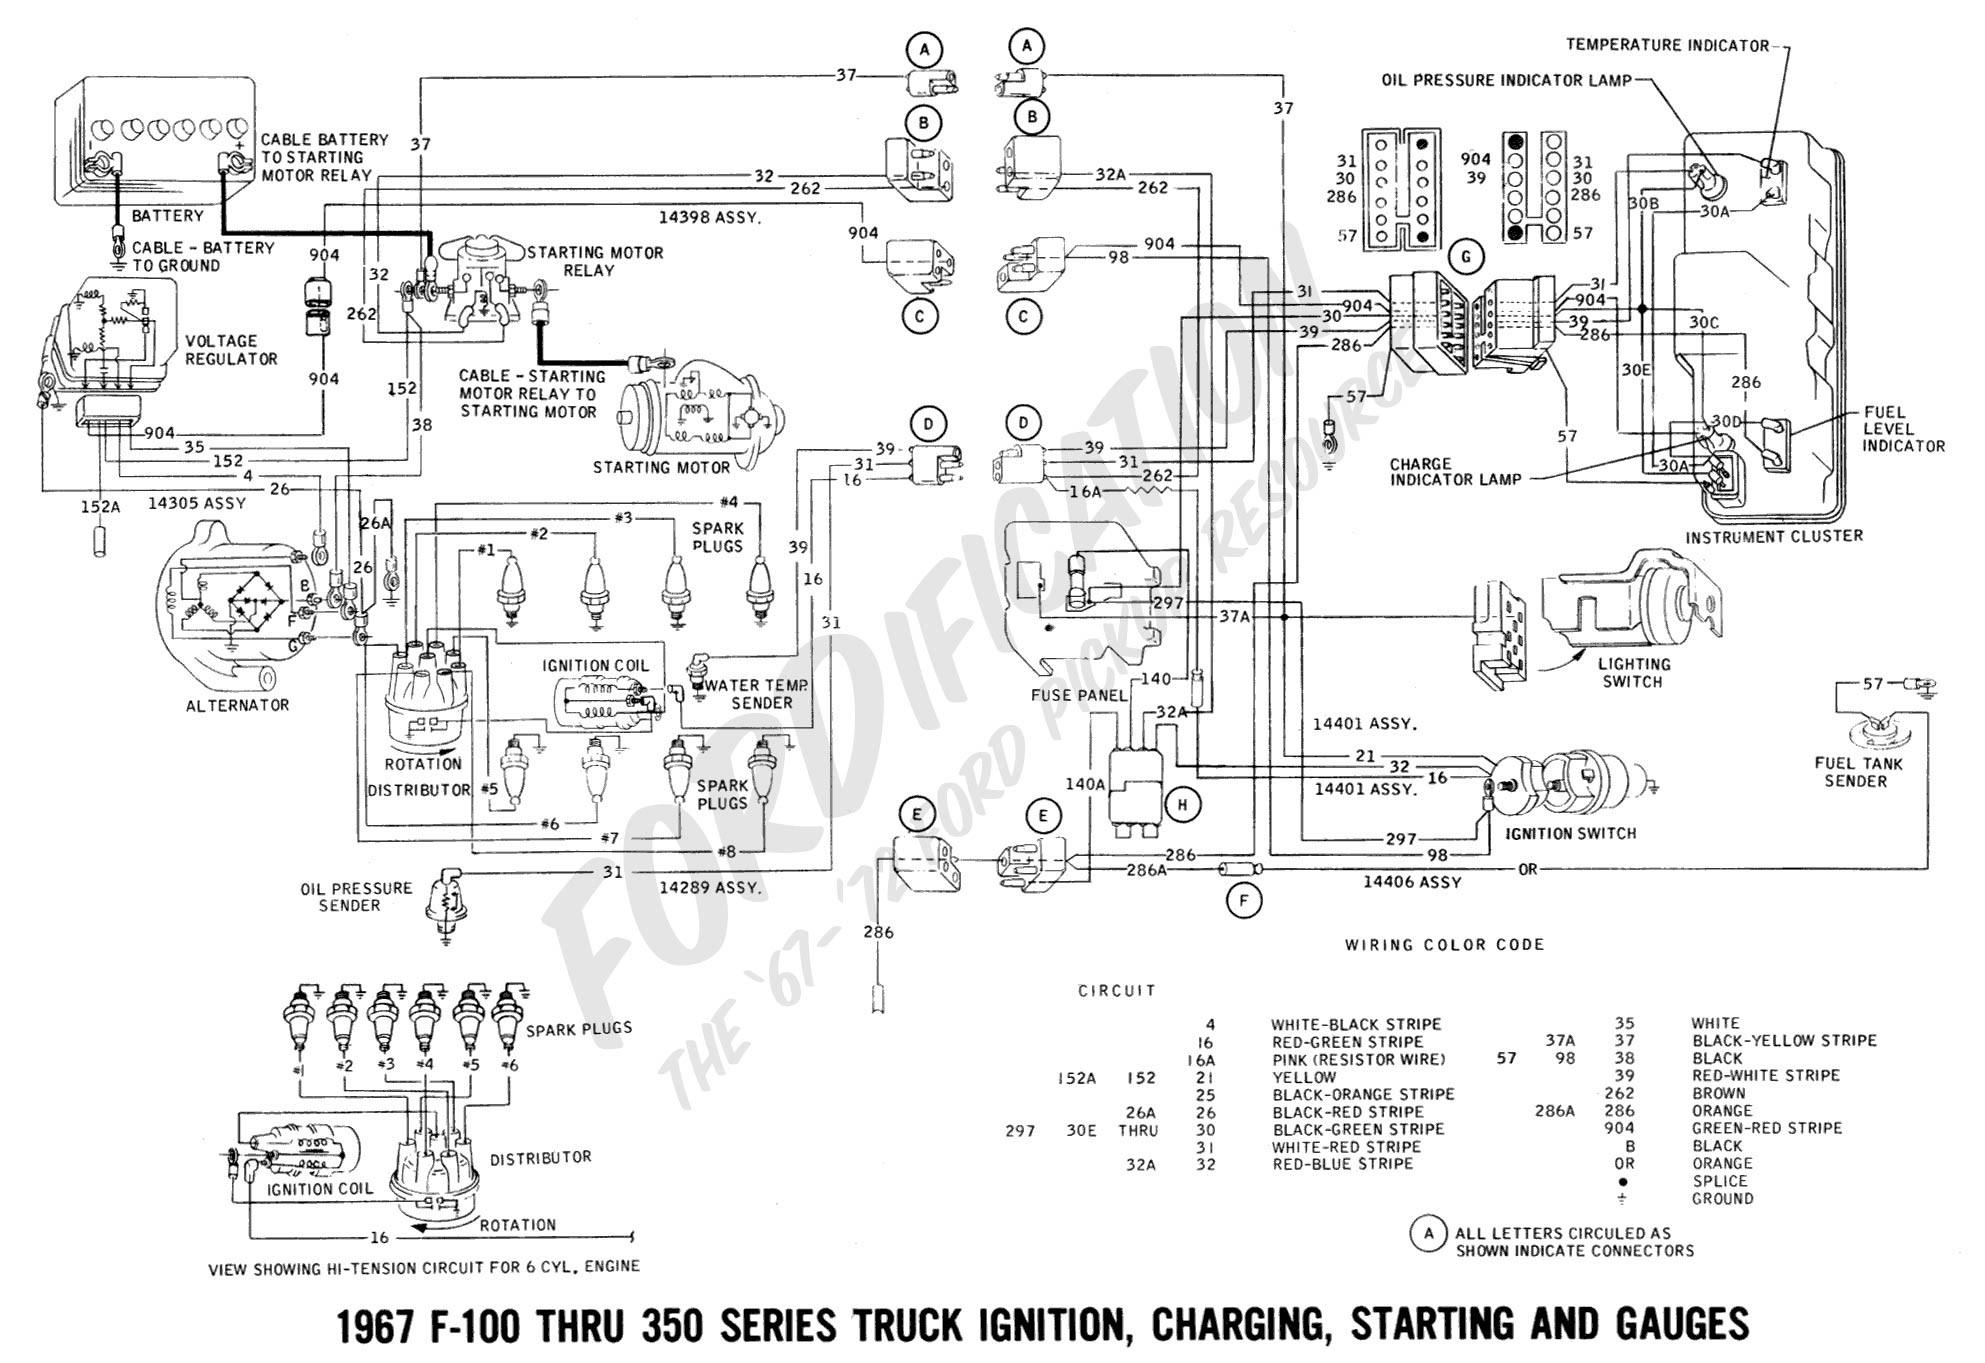 1966 mustang wiring diagrams average joe restoration 1968 mustang engine wiring diagram diagram source  1968 mustang engine wiring diagram